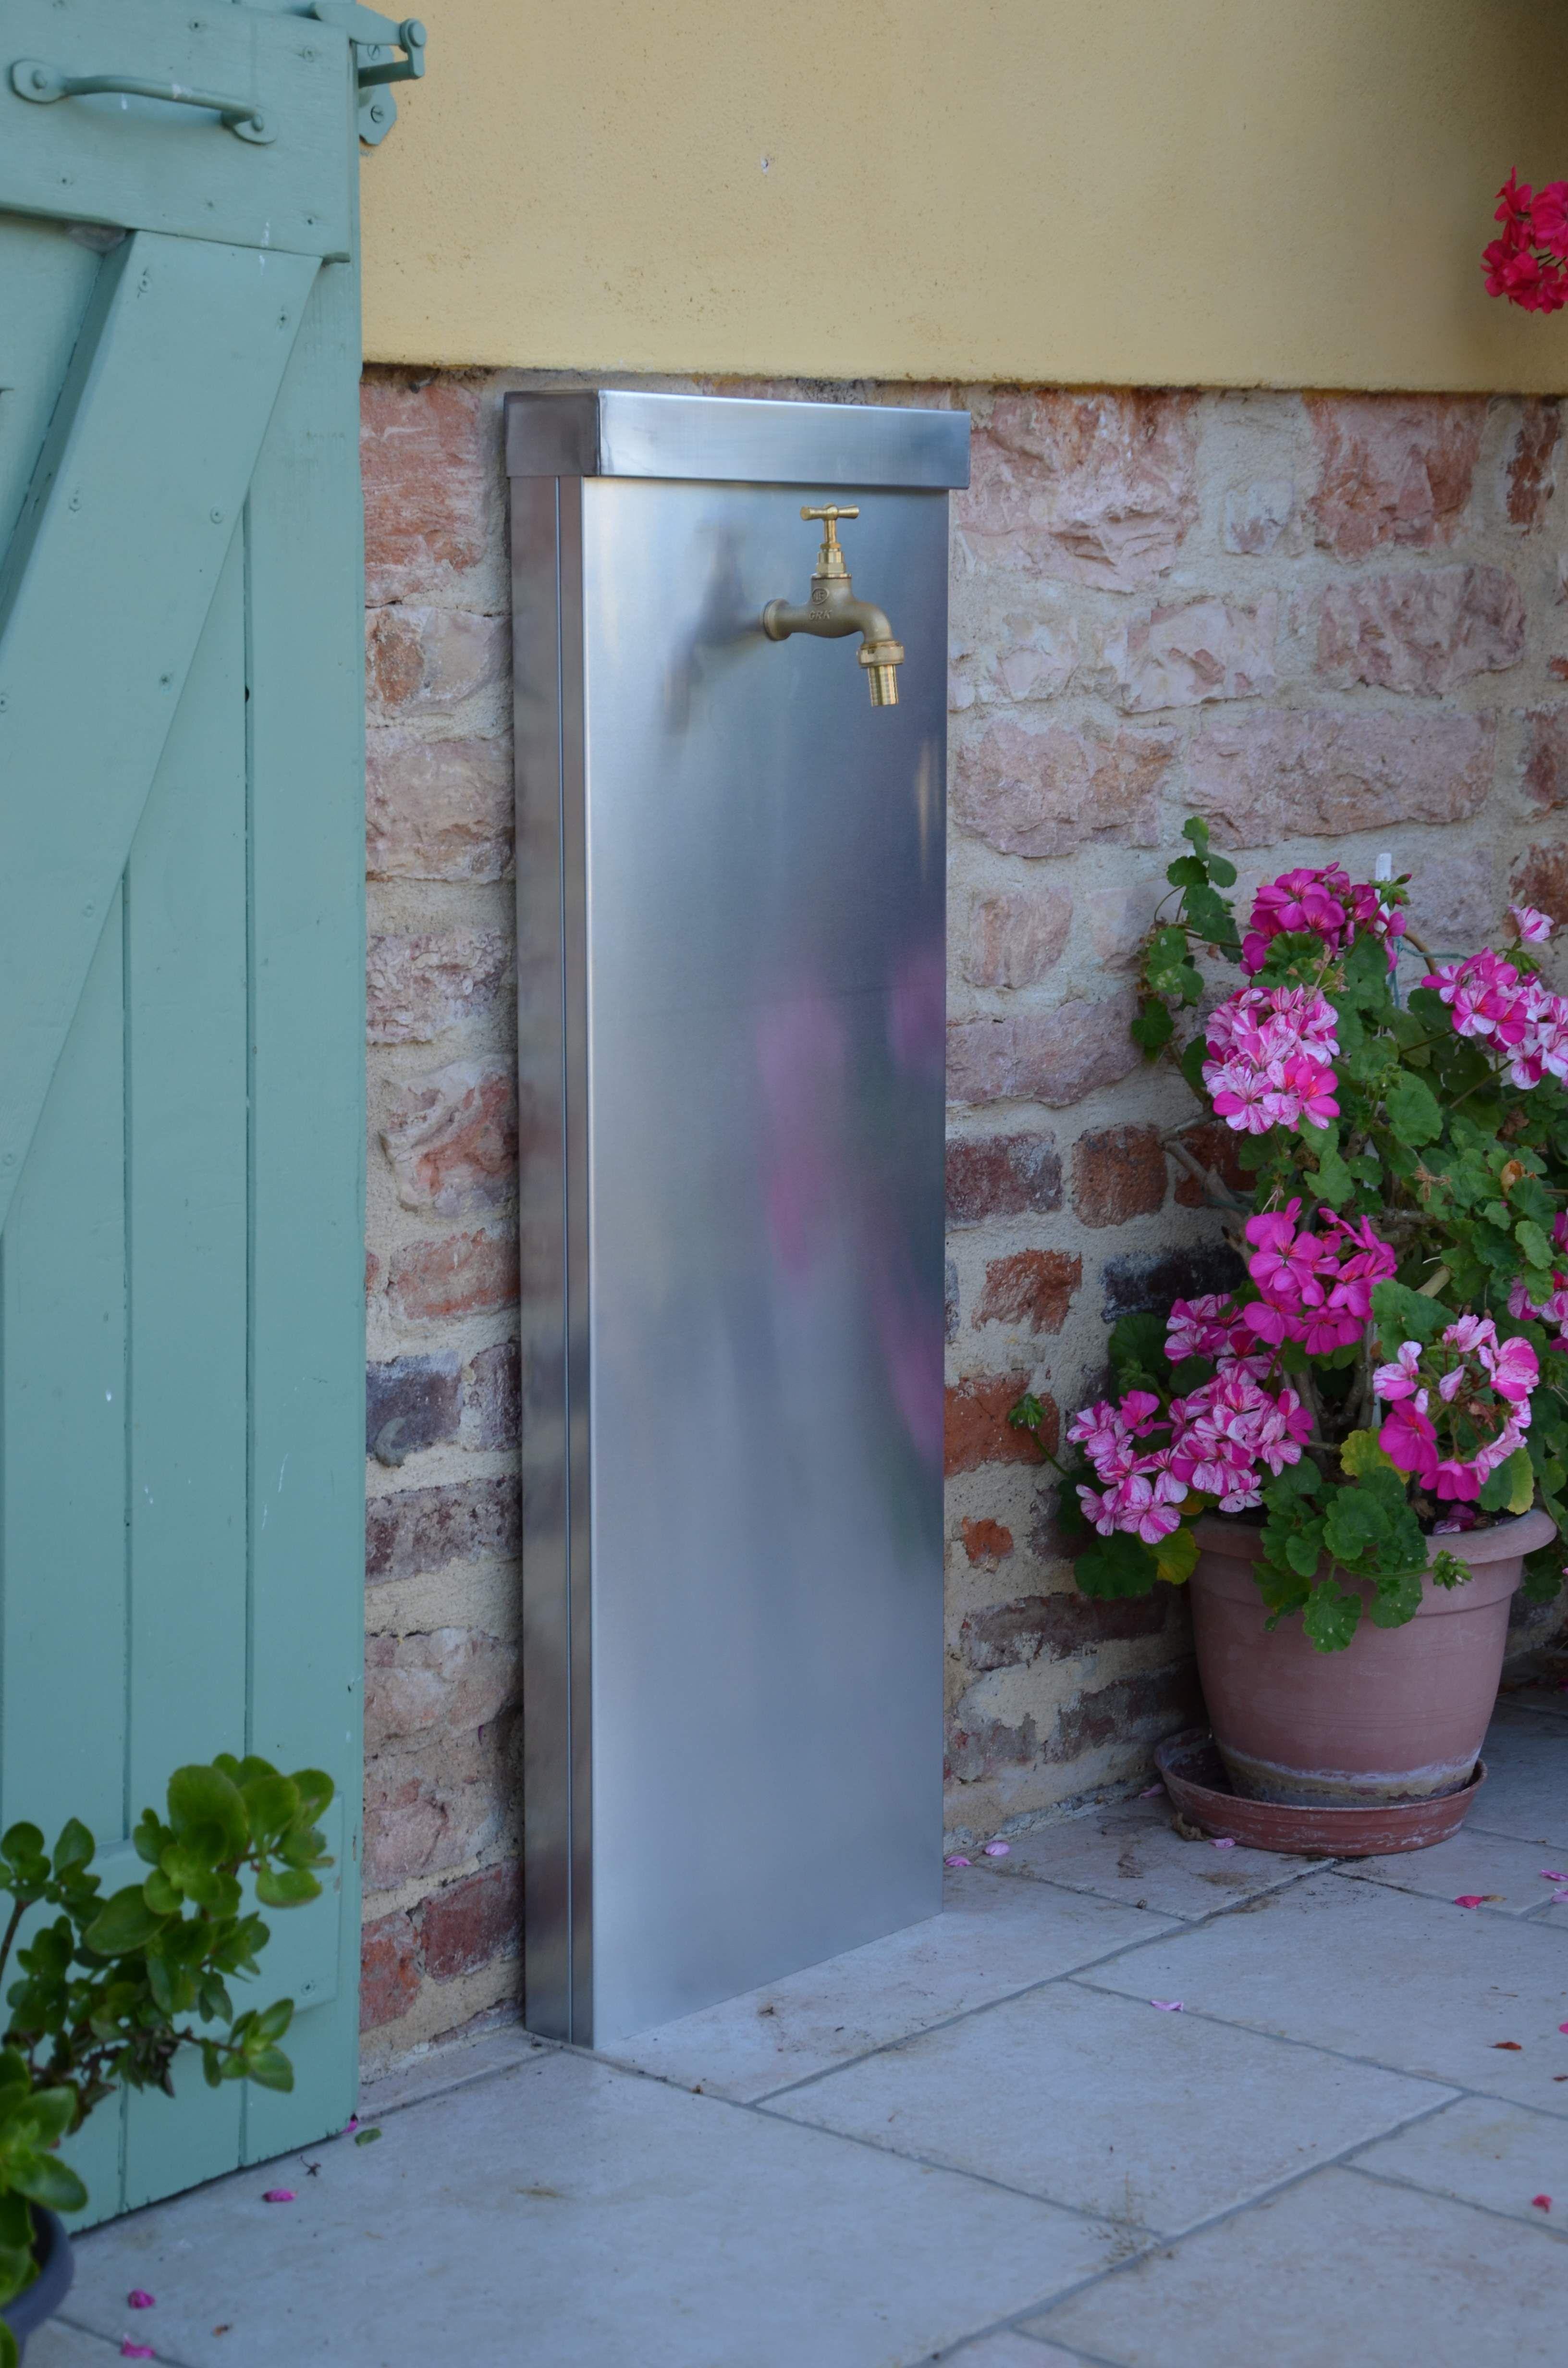 fontaine de jardin pas cher petite fontaine de jardin beau petit bassin de jardin pas cher. Black Bedroom Furniture Sets. Home Design Ideas